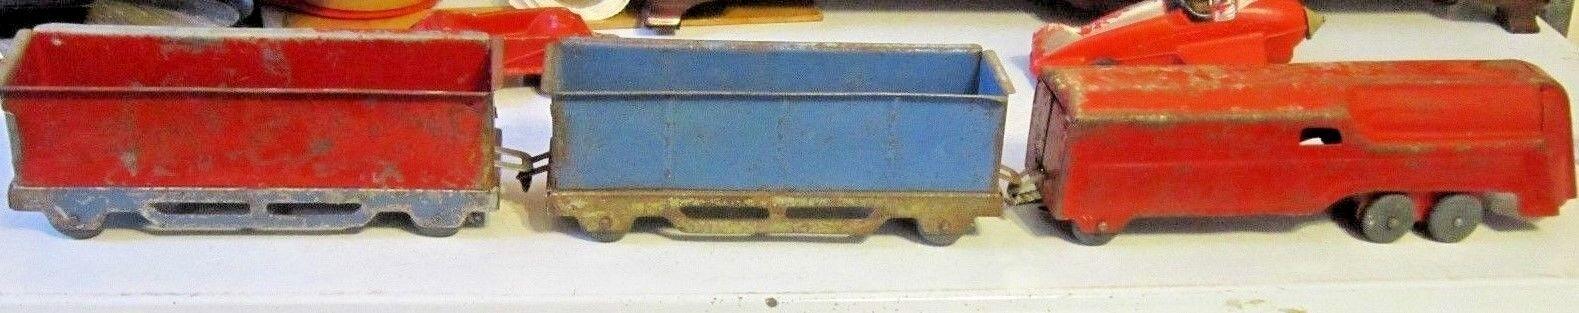 Antique Wyandotte Toys Pressed Steel Train Engine & 2 Rail Cars w/Wooden Wheels